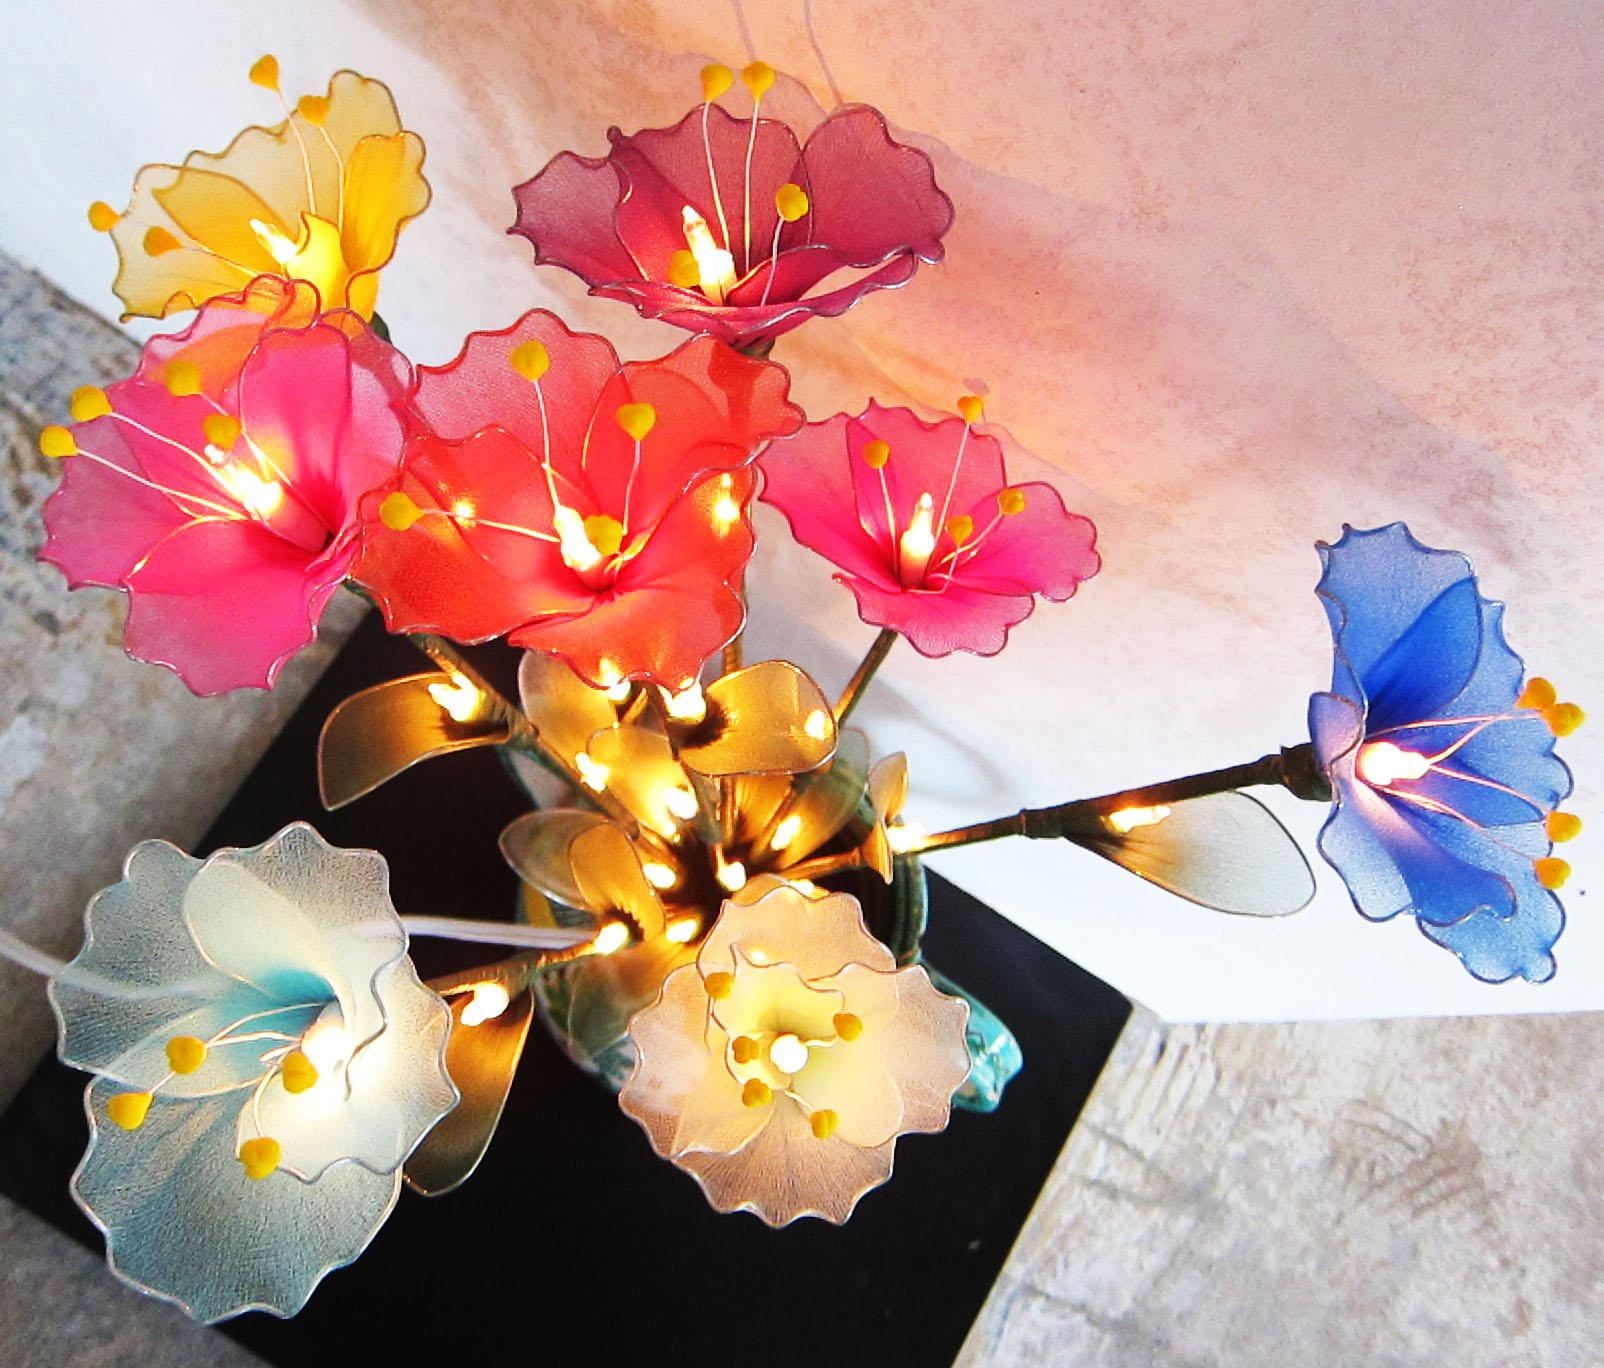 Flower Lights__4062